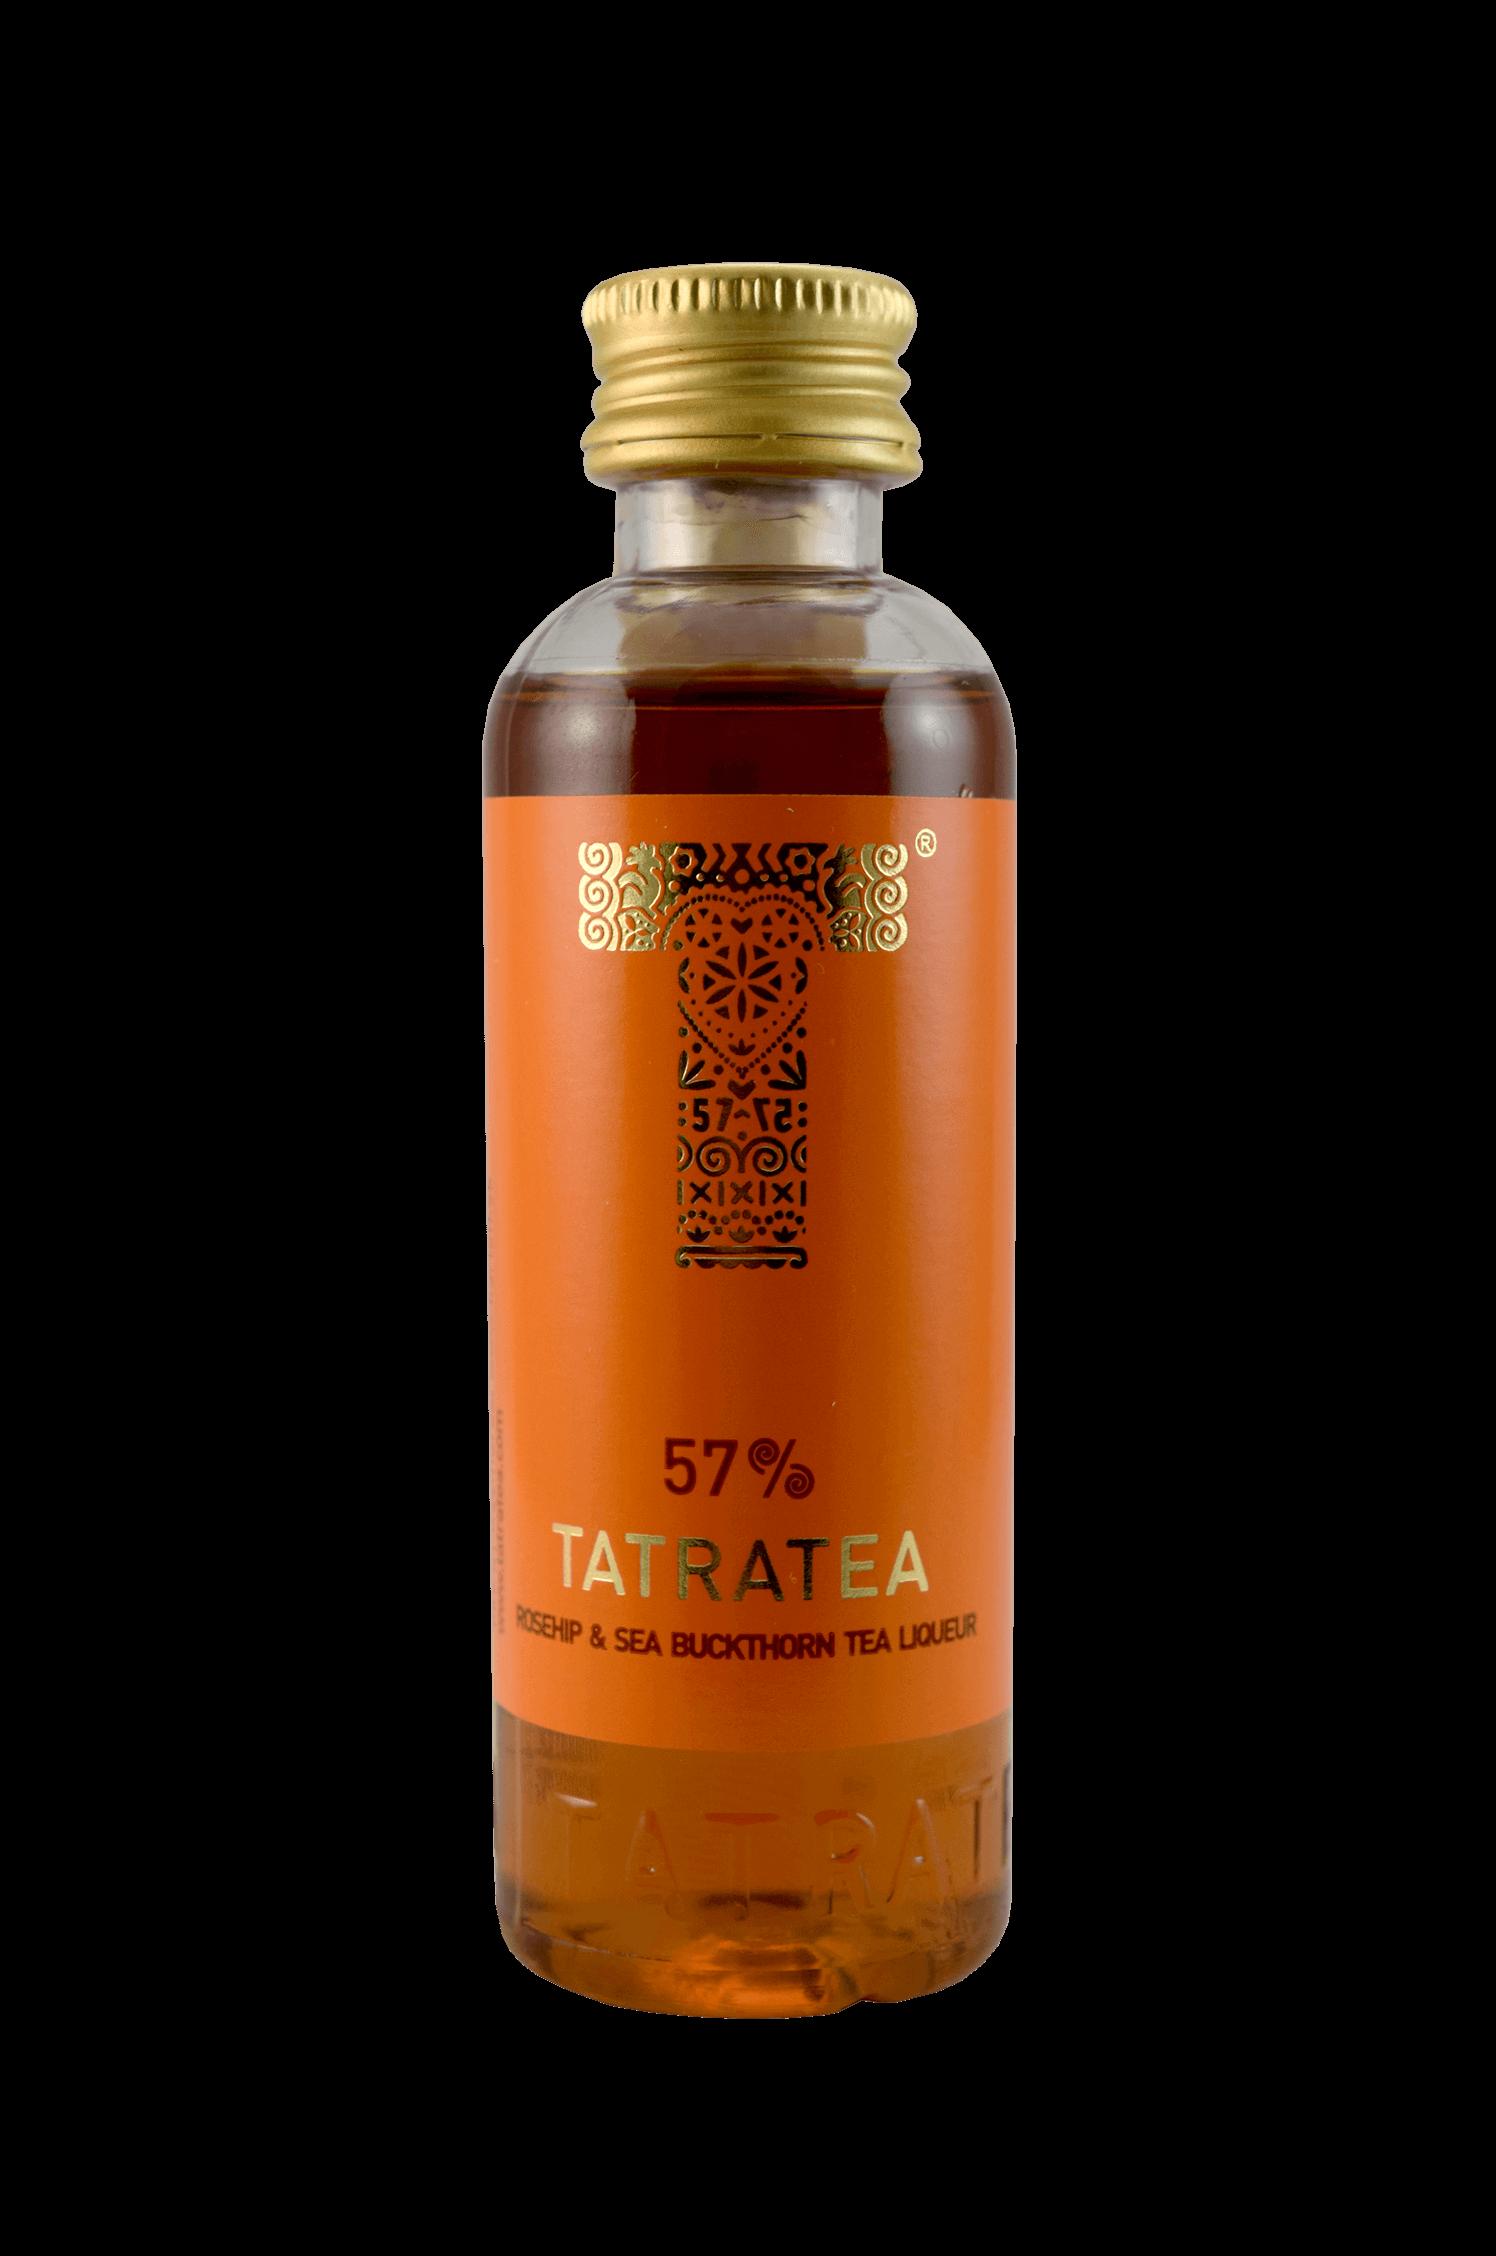 Tatratea Rosehip & Sea Buckthorn Tea Liqueur